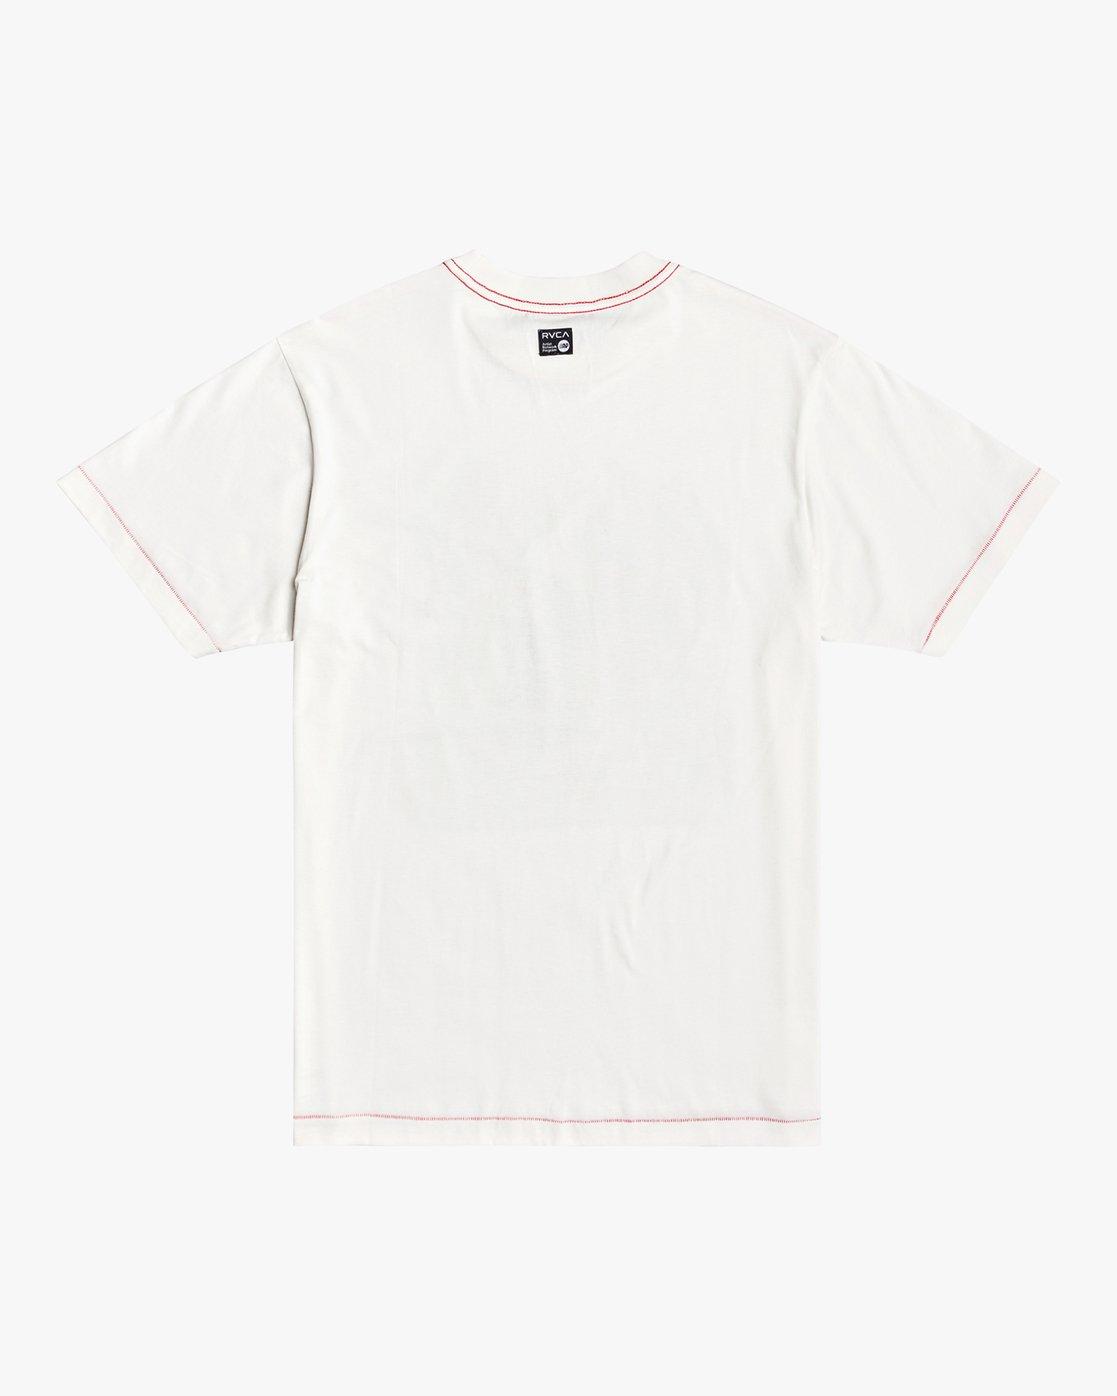 1 Stacey Rozich Bone - T-shirt pour Homme Blanc U1SSRFRVF0 RVCA